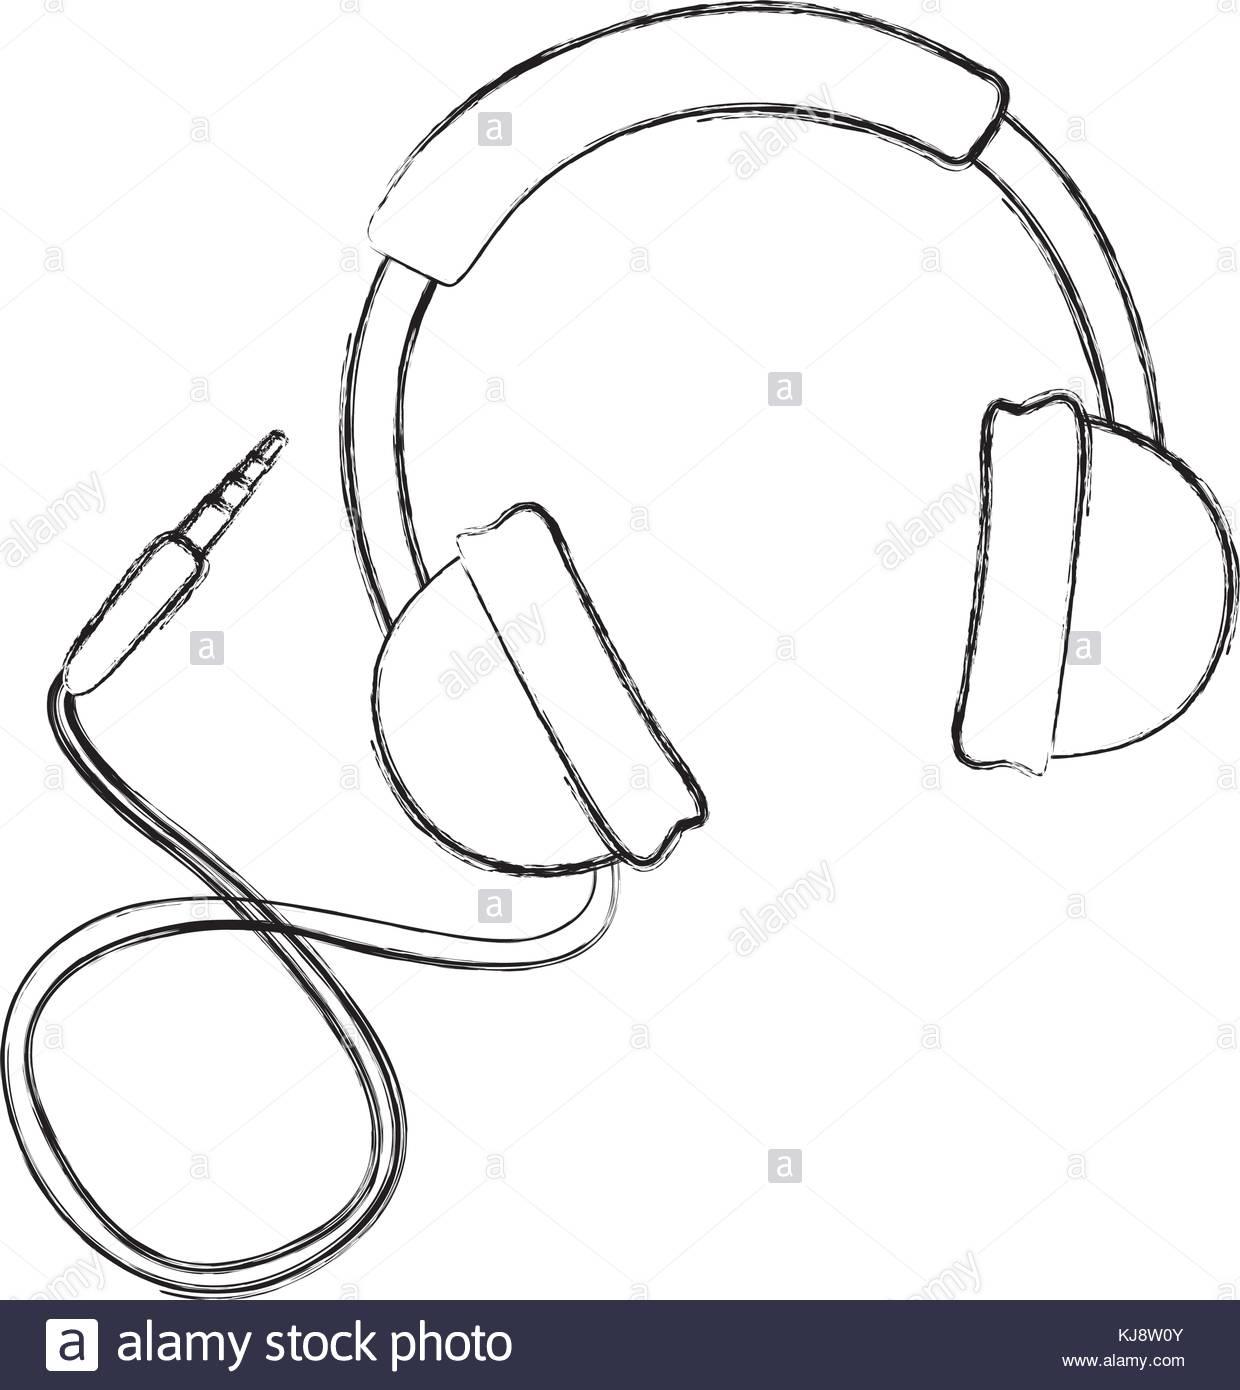 1240x1390 Sketch Draw Headphones Cartoon Stock Vector Art Amp Illustration